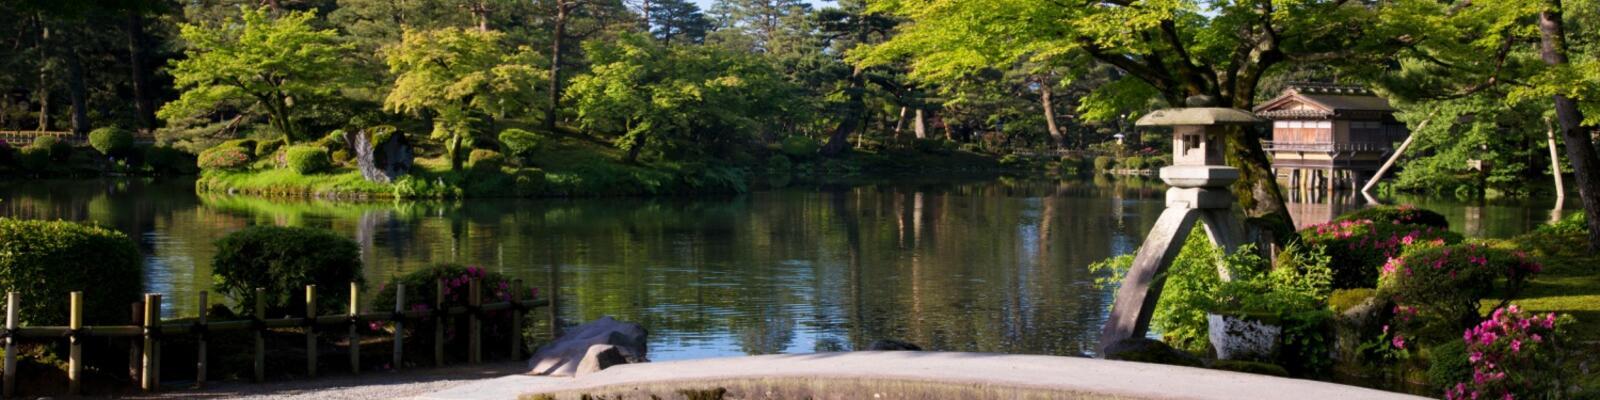 Kanazawa Kenroku-en garden_3.jpg